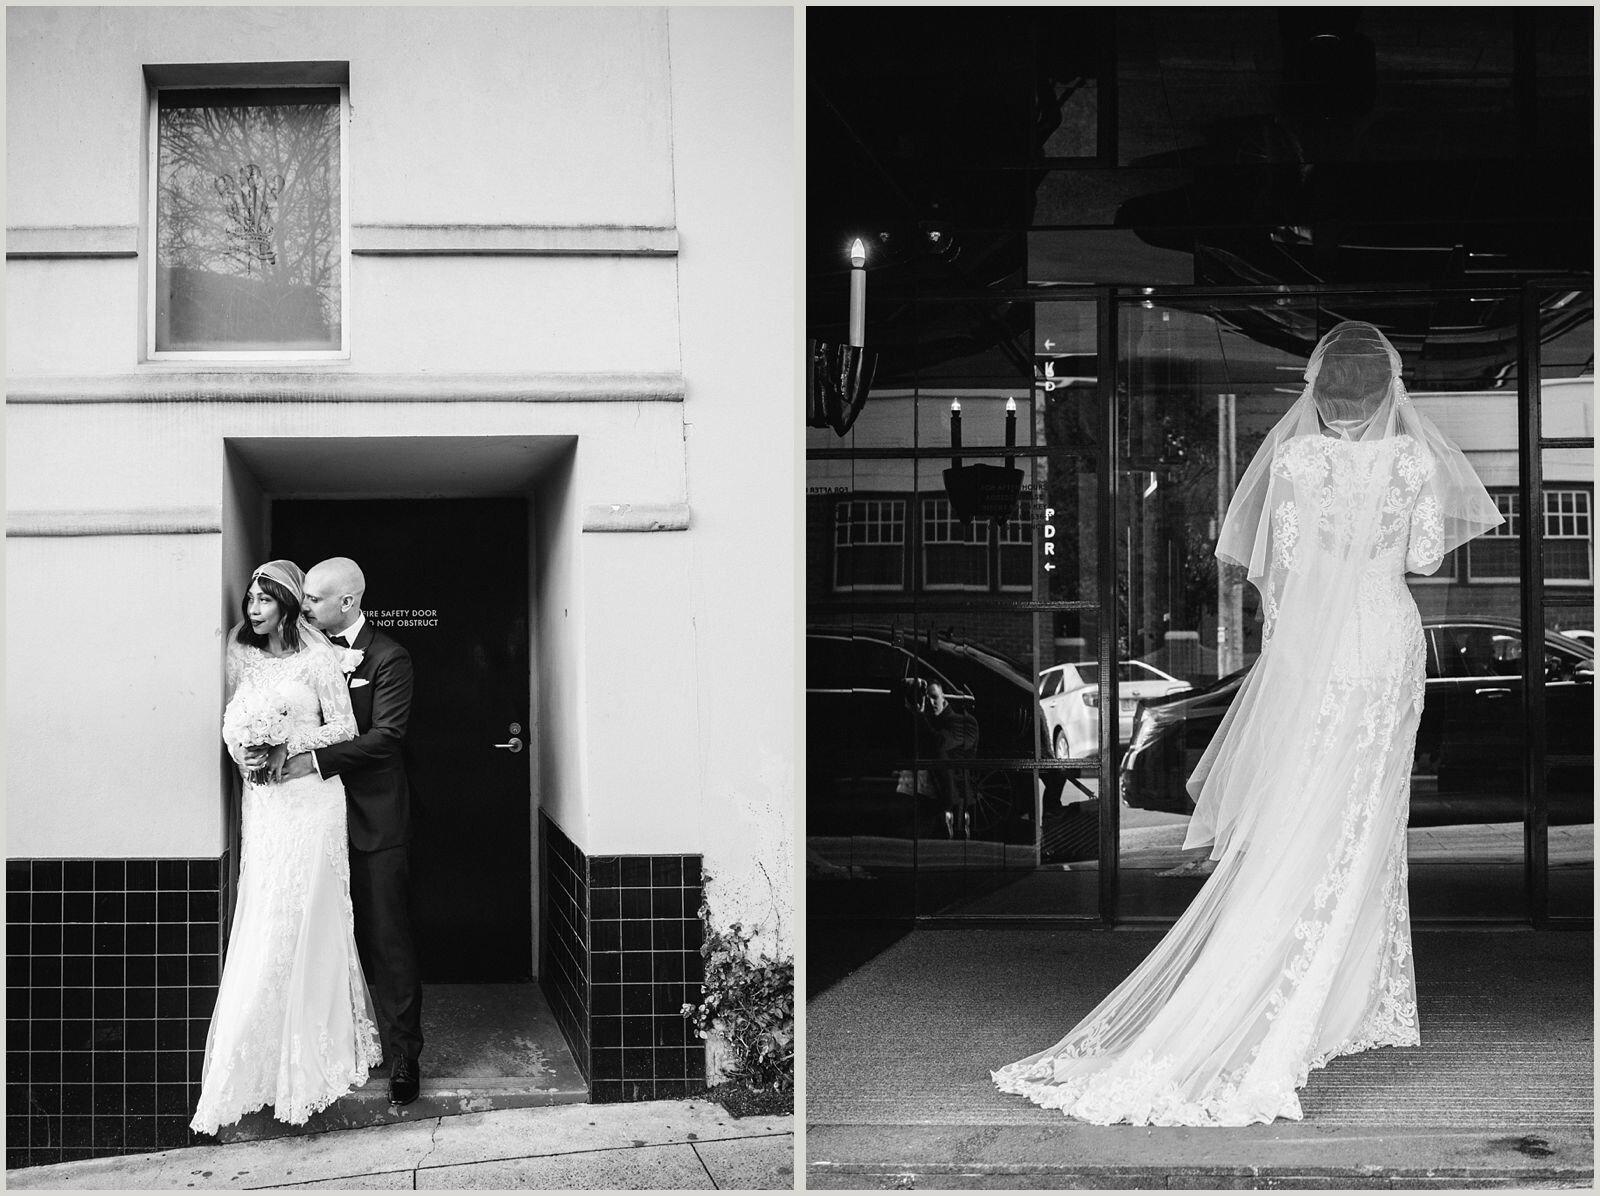 joseph_koprek_wedding_melbourne_the_prince_deck_0037.jpg